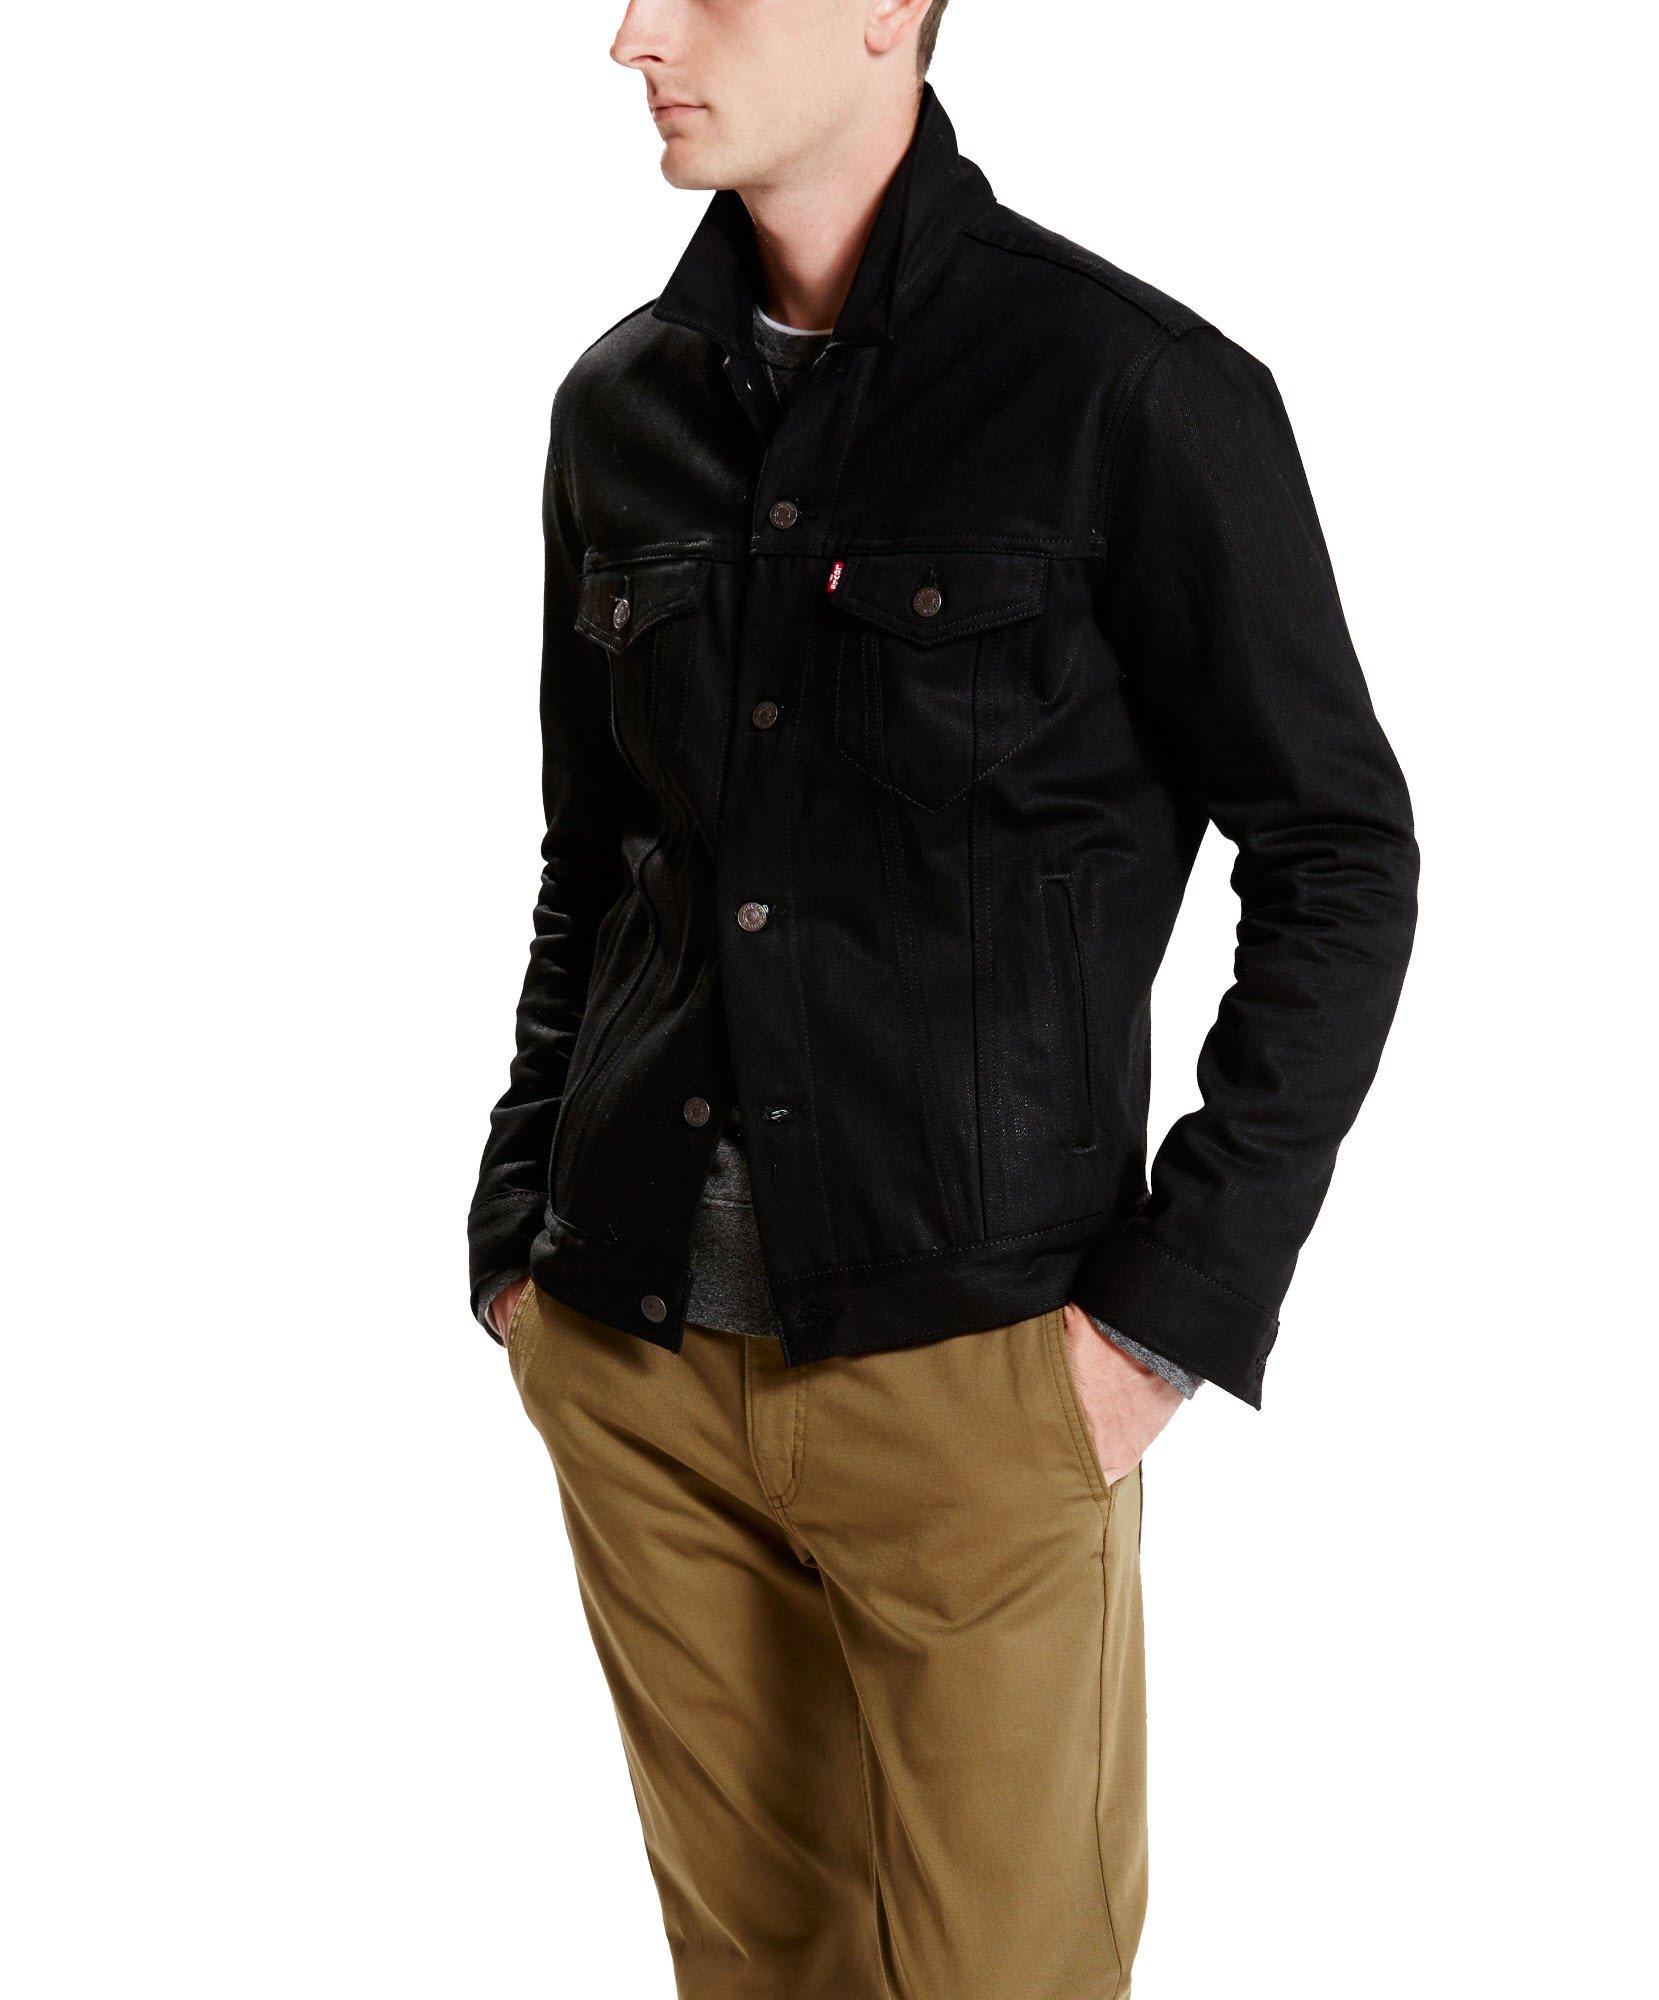 Levi's Regular Fit Trucker Jacket (Medium, Polished Black)